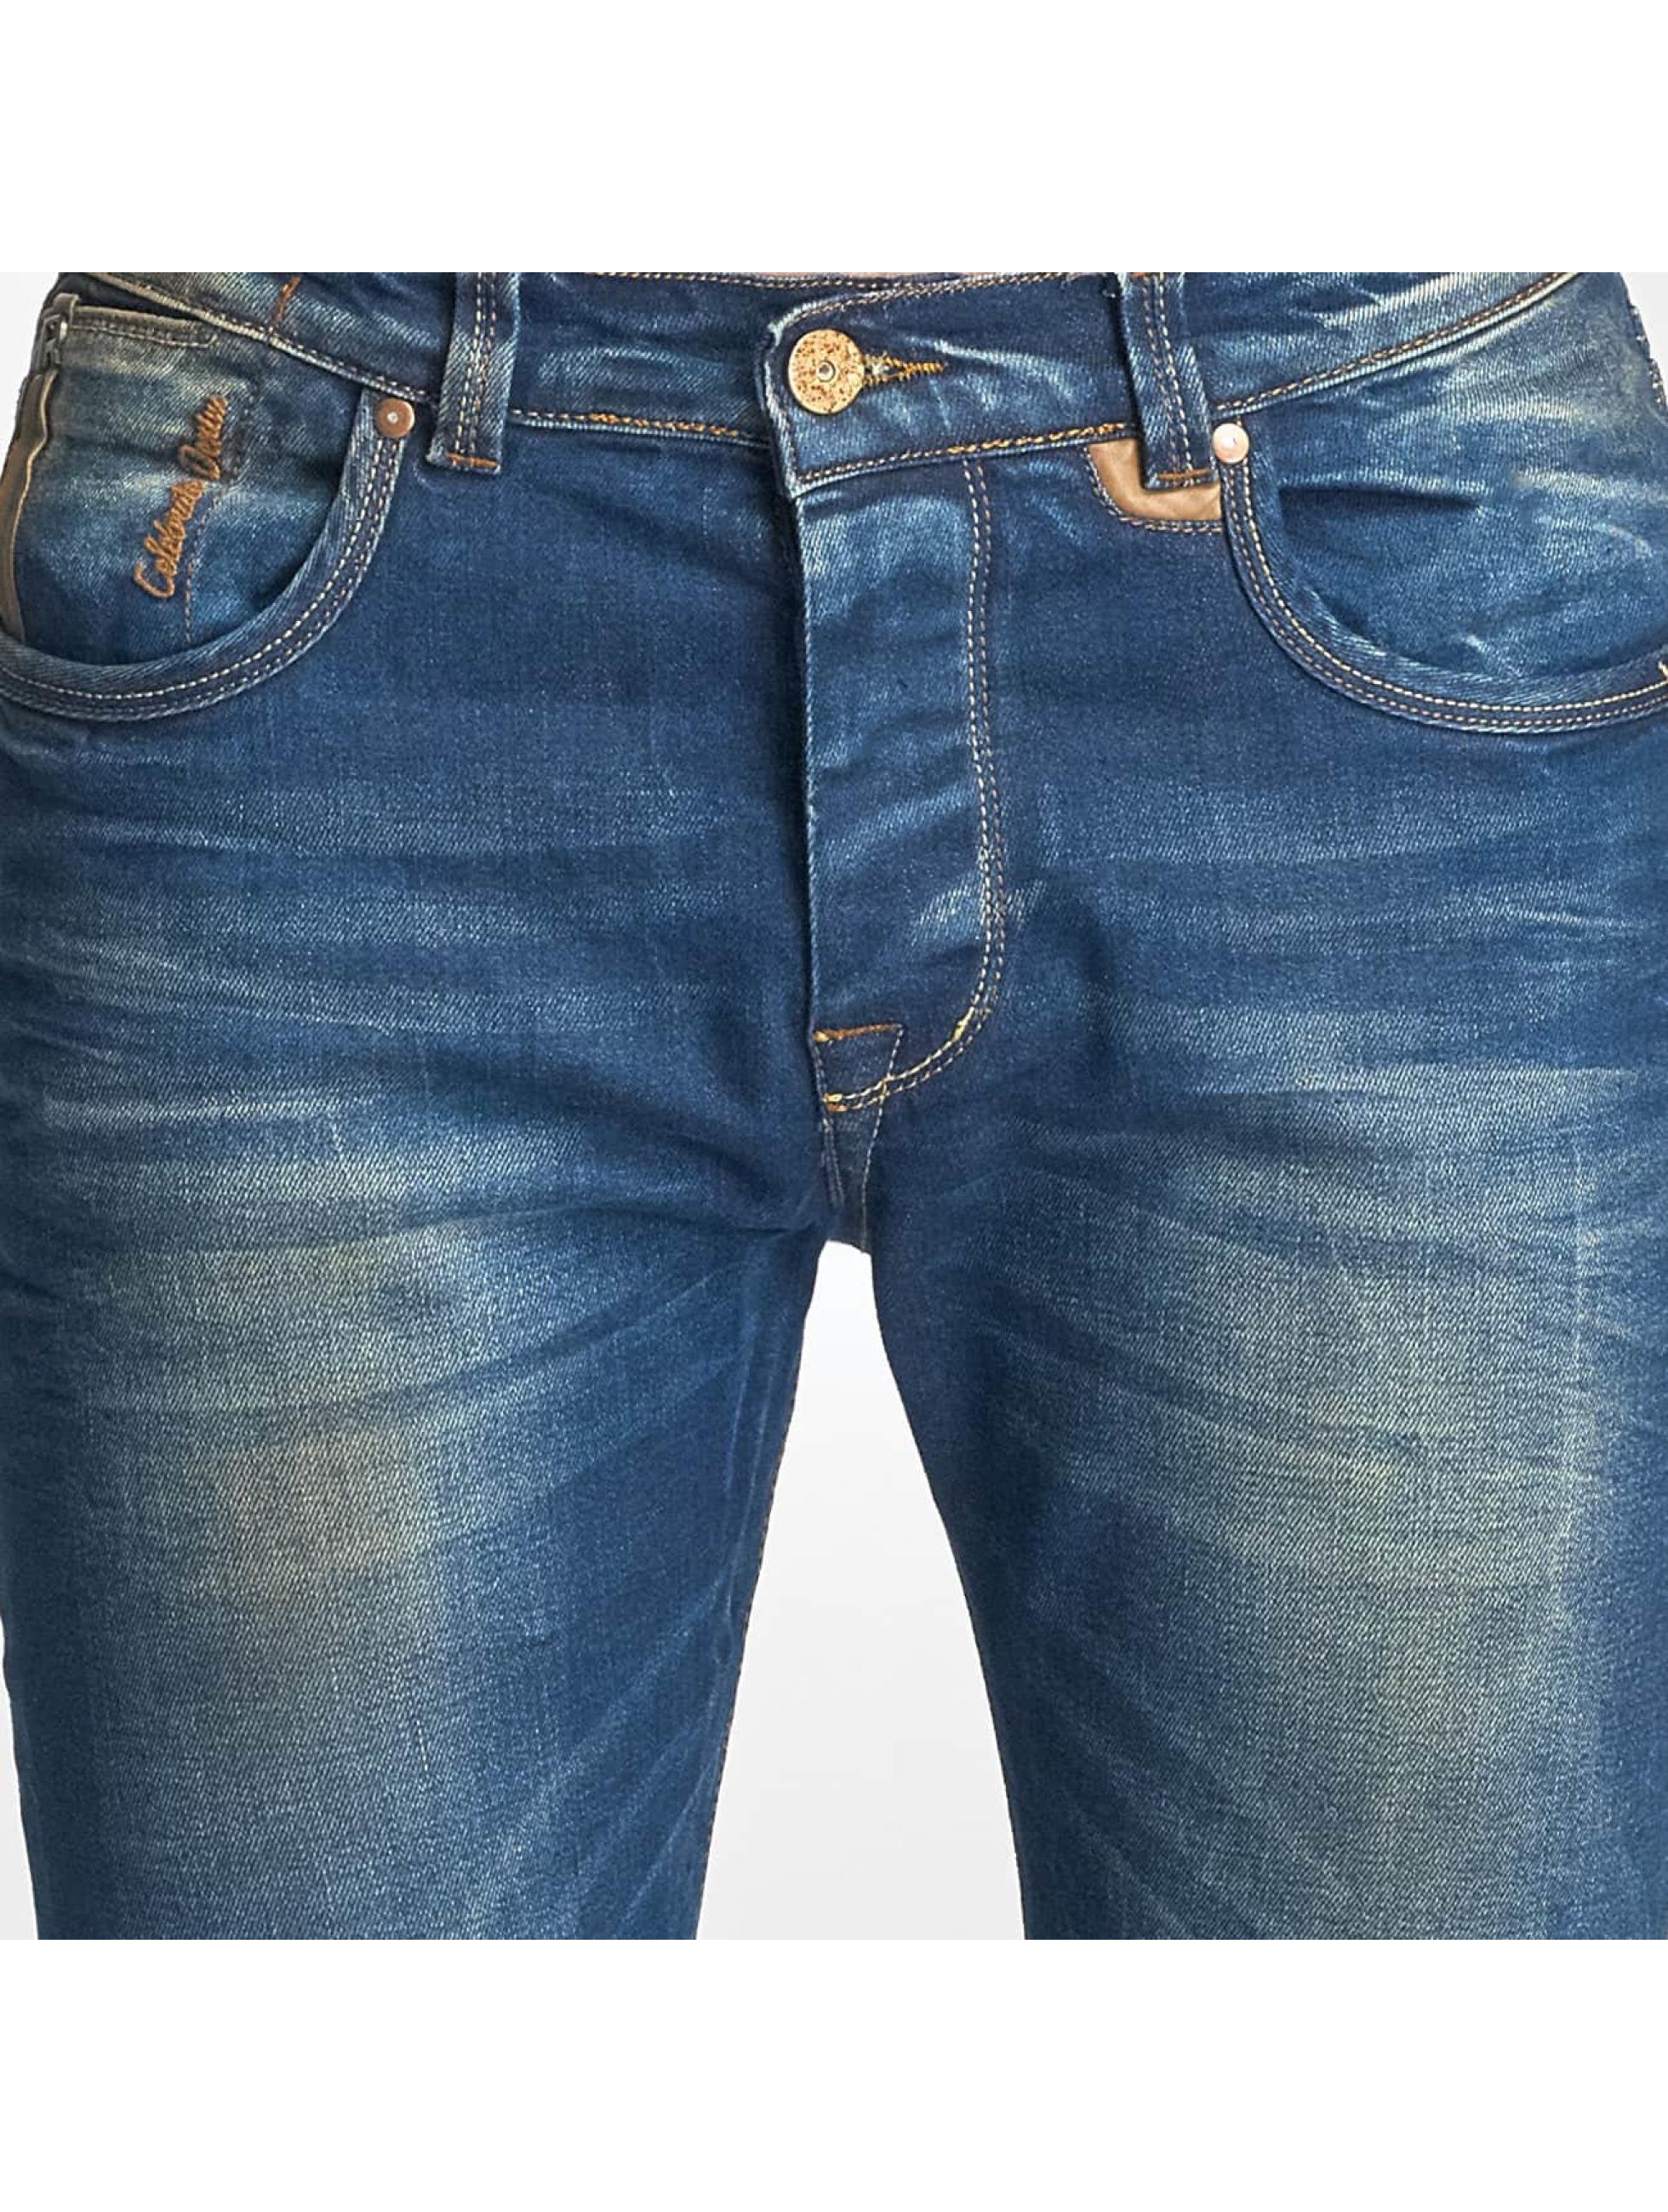 Red Bridge Slim Fit Jeans Washed blue